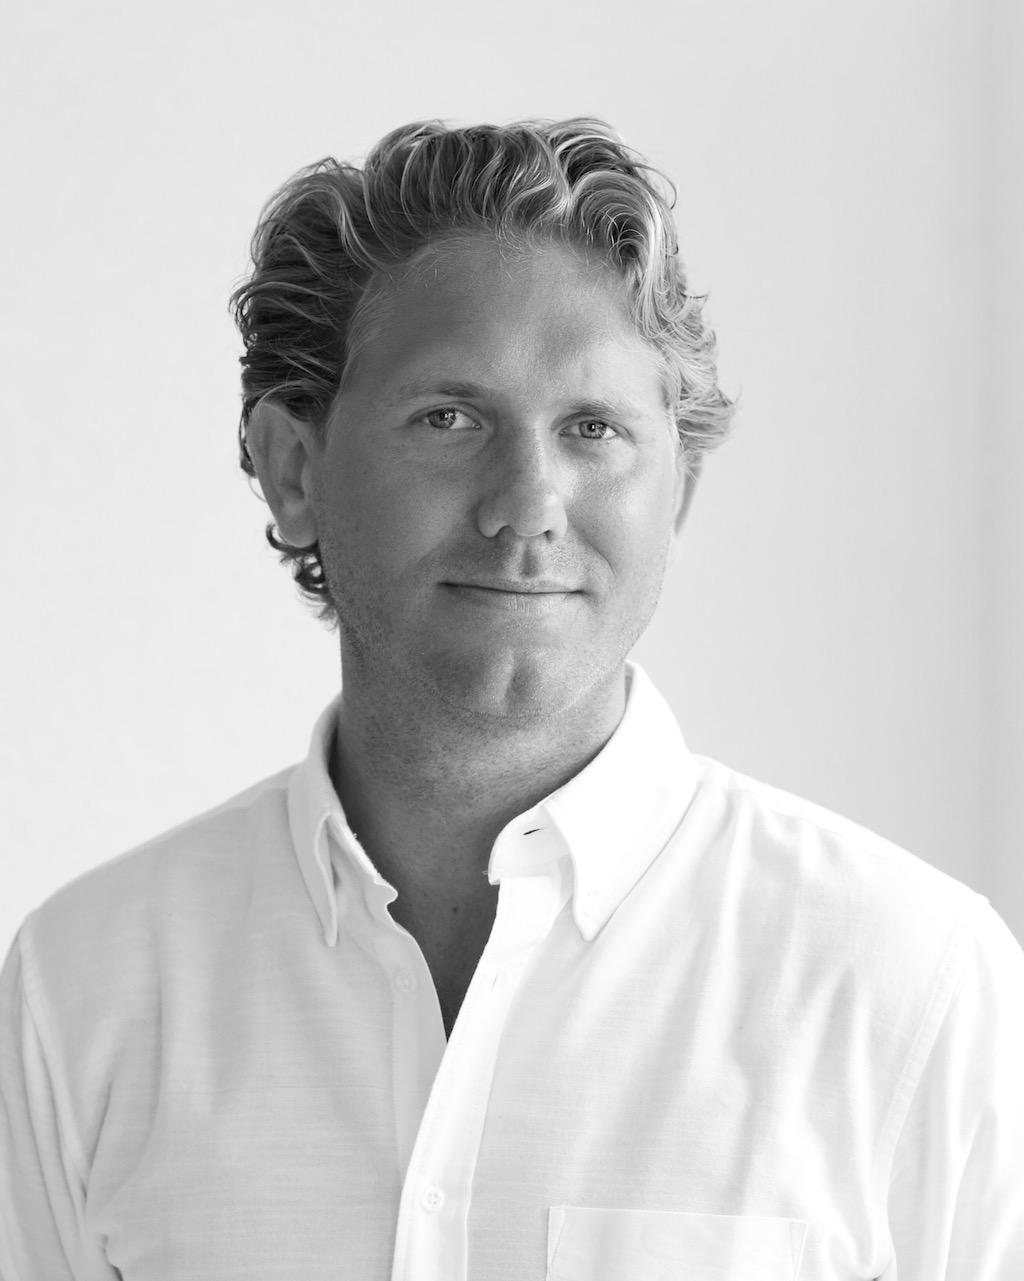 Martin Mattson